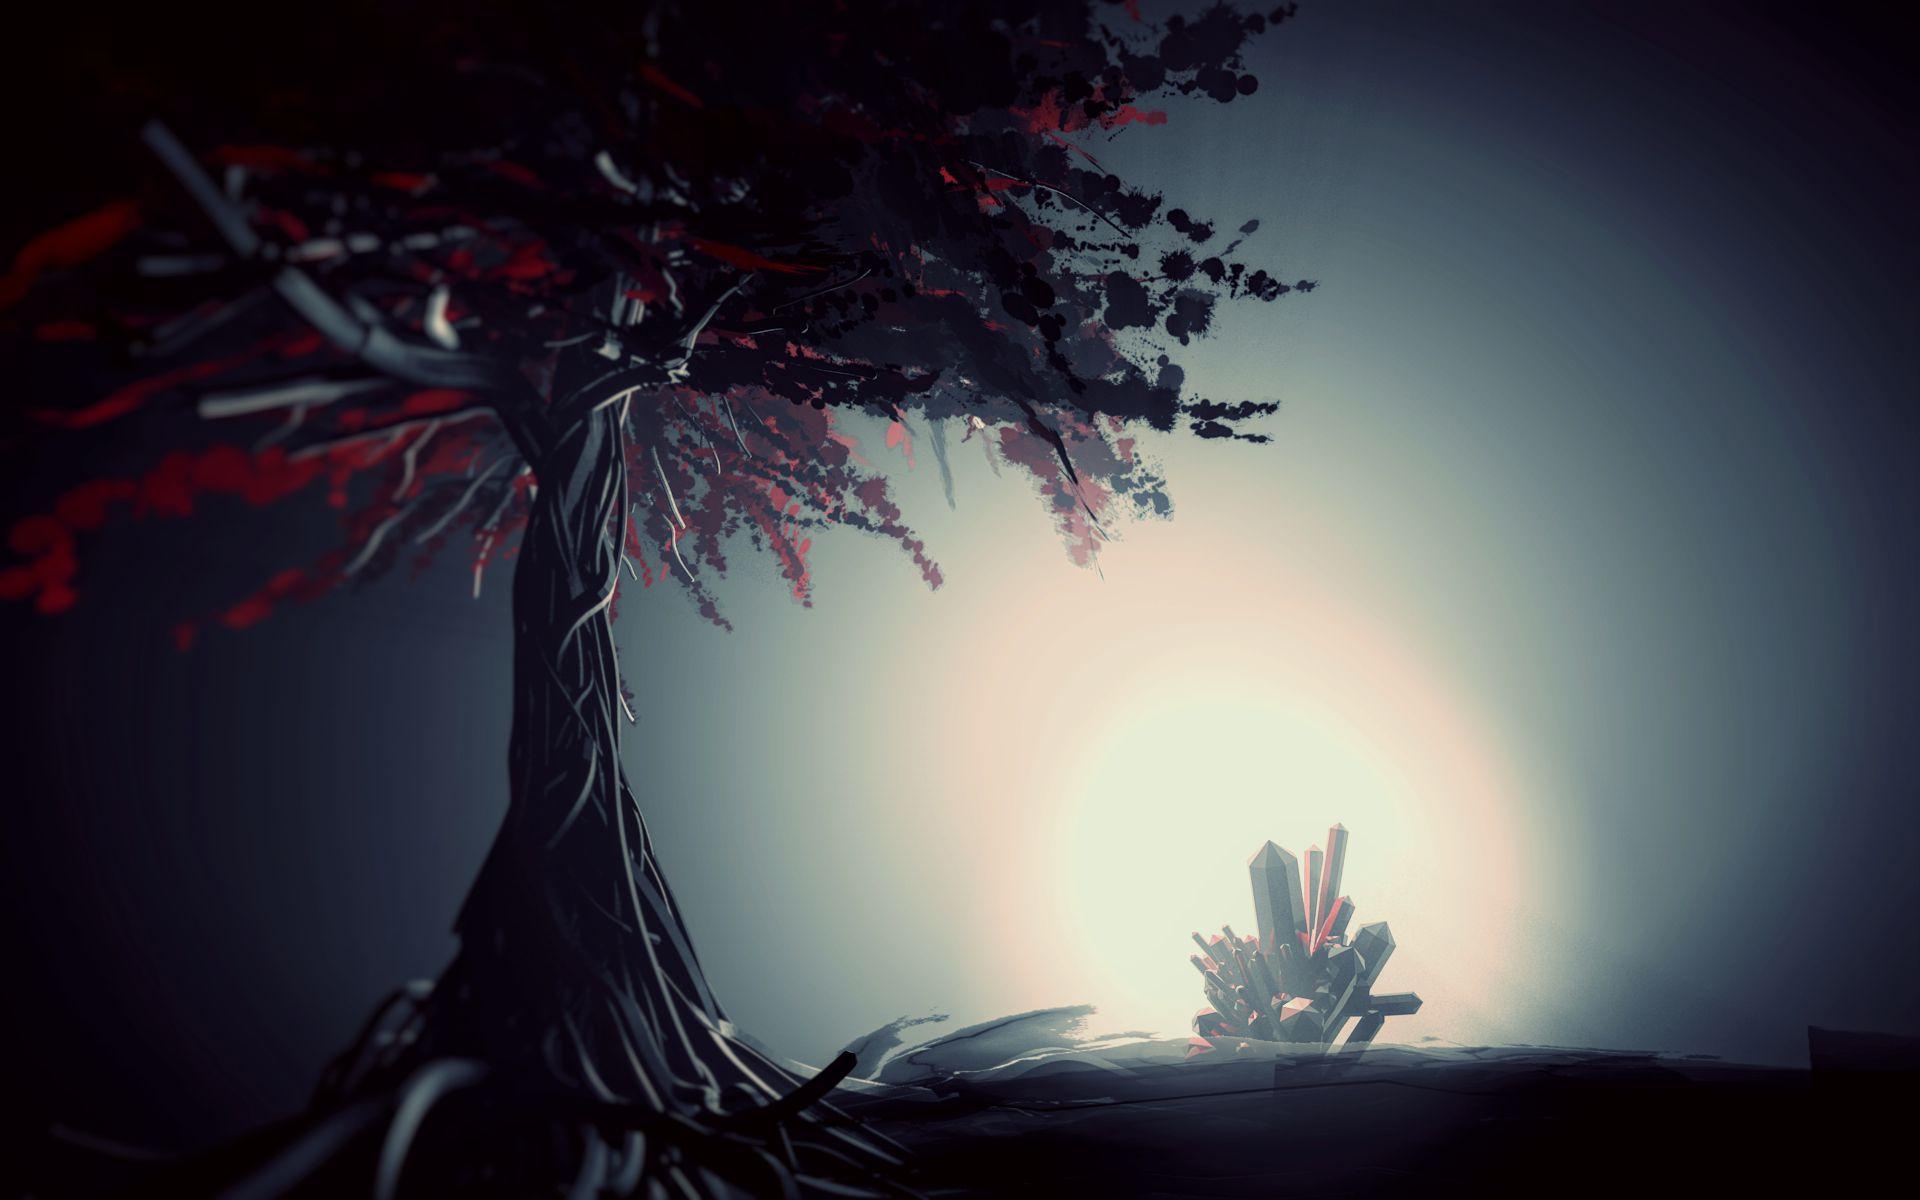 vrhuman Artifacts - VR Stories